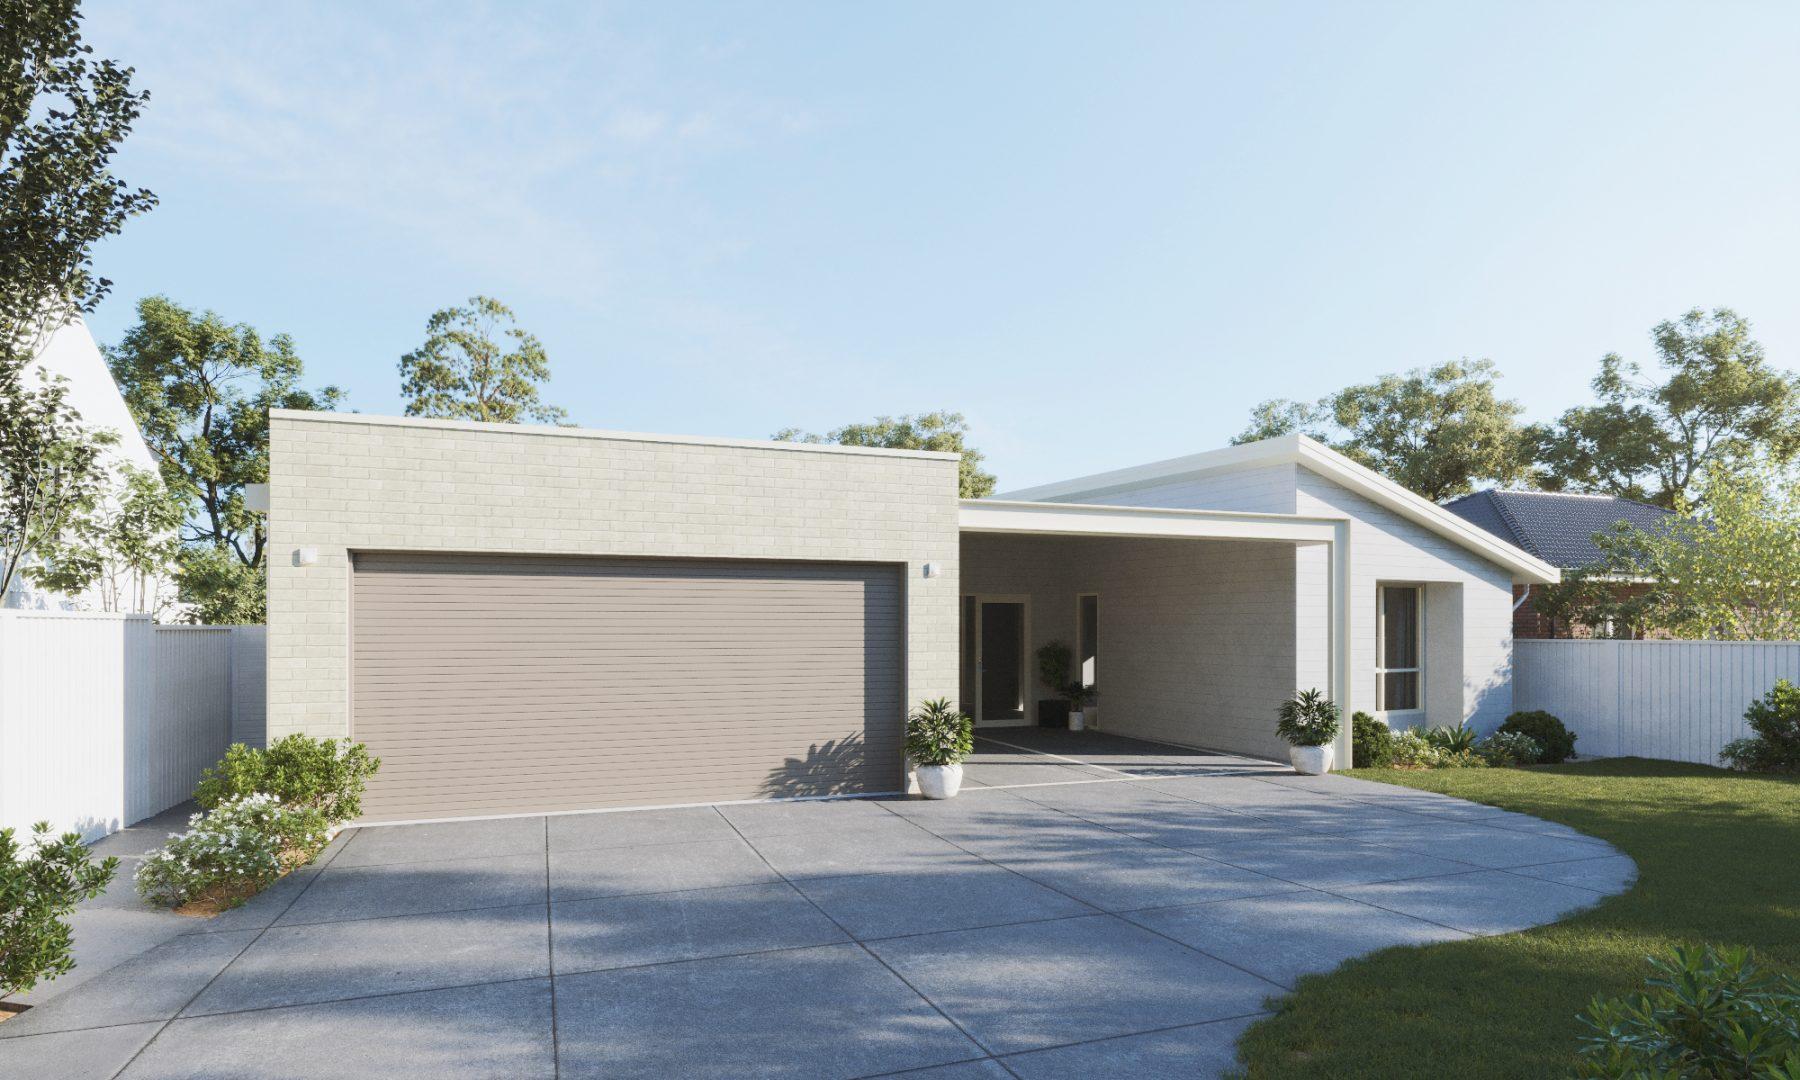 3D Renders For Property Marketing - Exterior Render